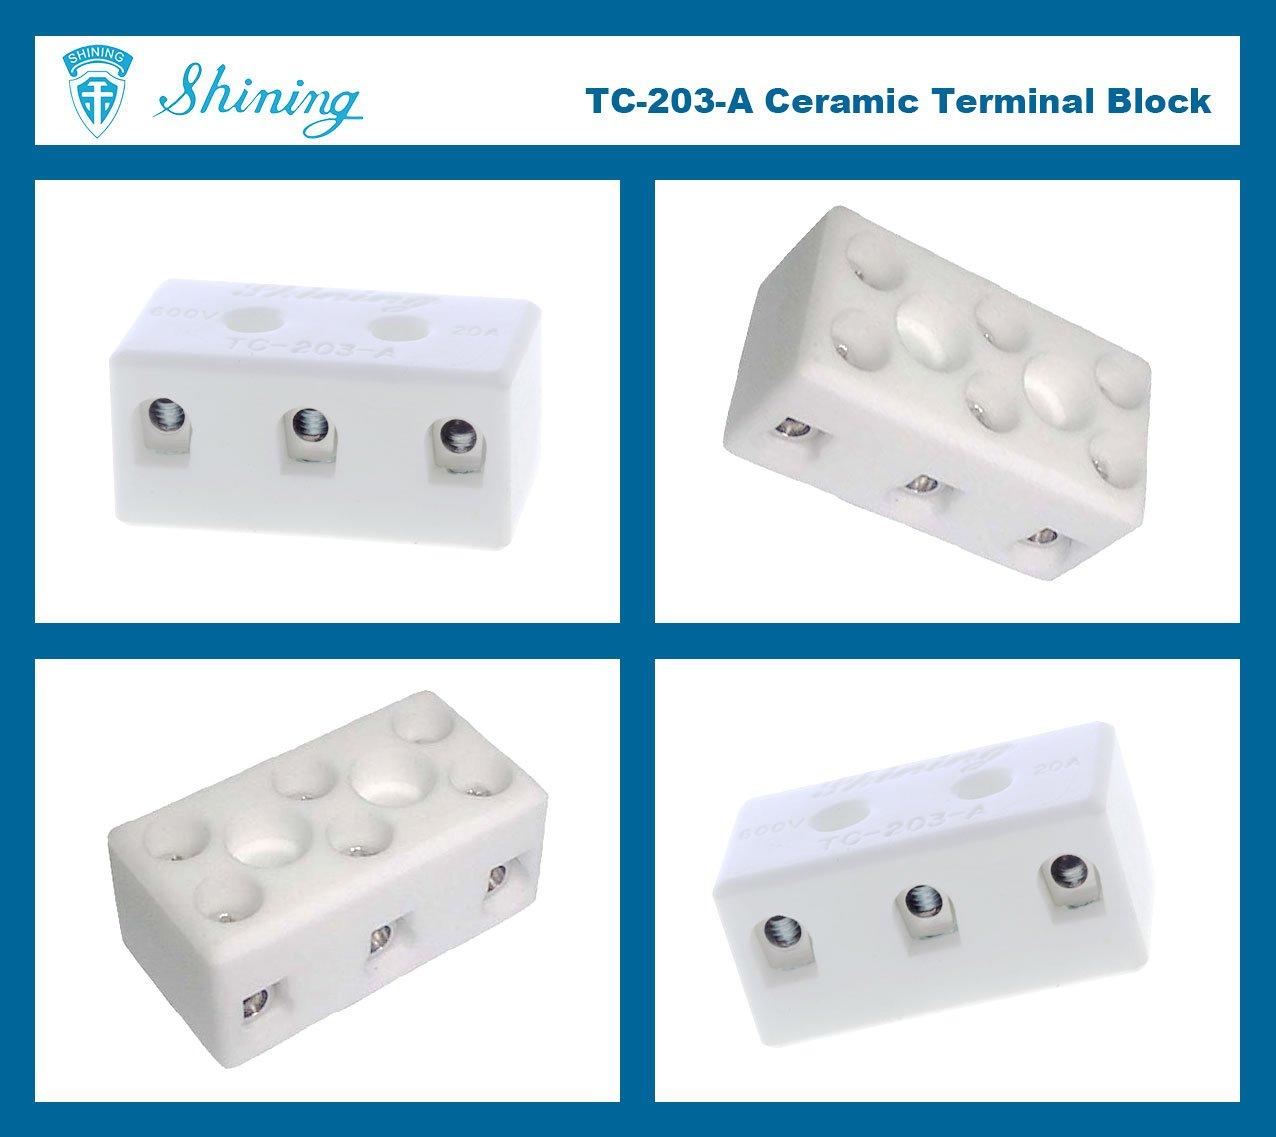 TC-203-A Panel Mounted 600V 20A 3 Pole Ceramic Terminal Block